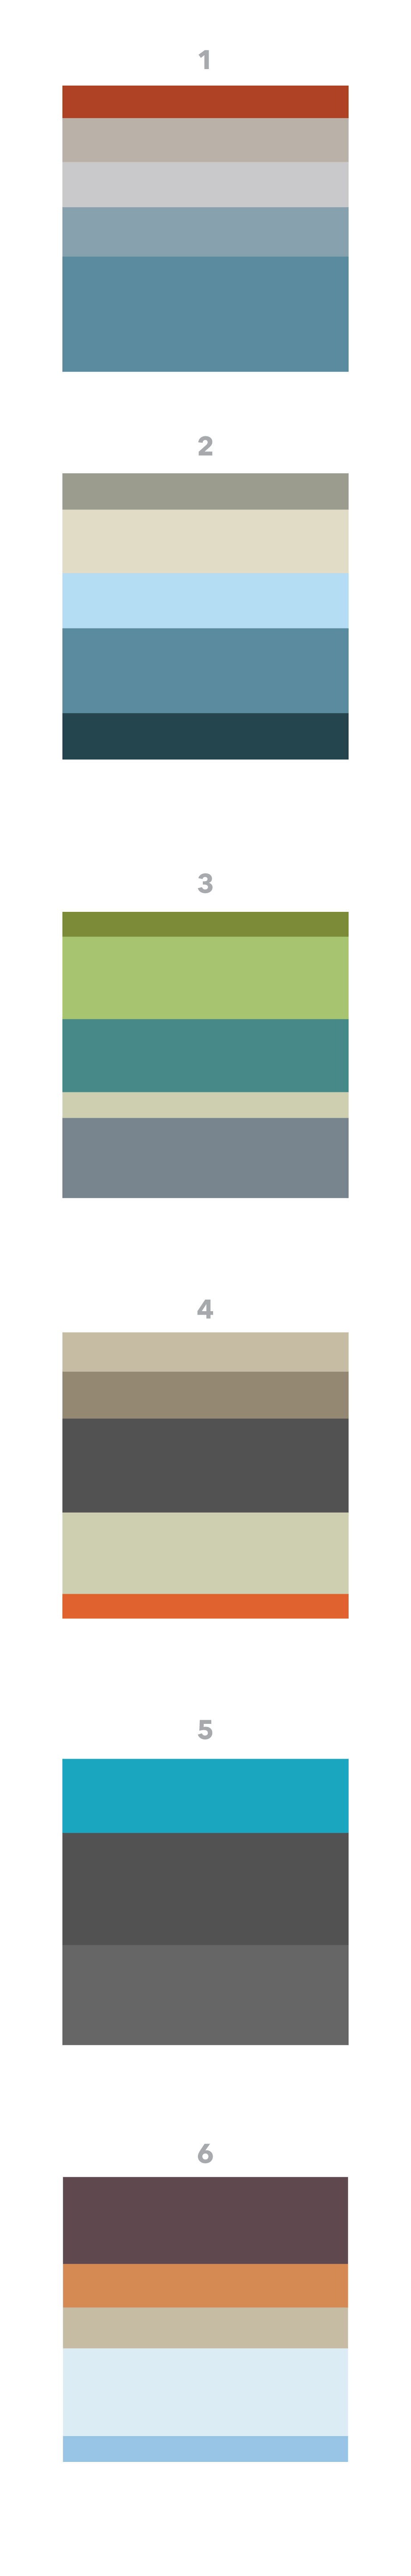 color-ideas